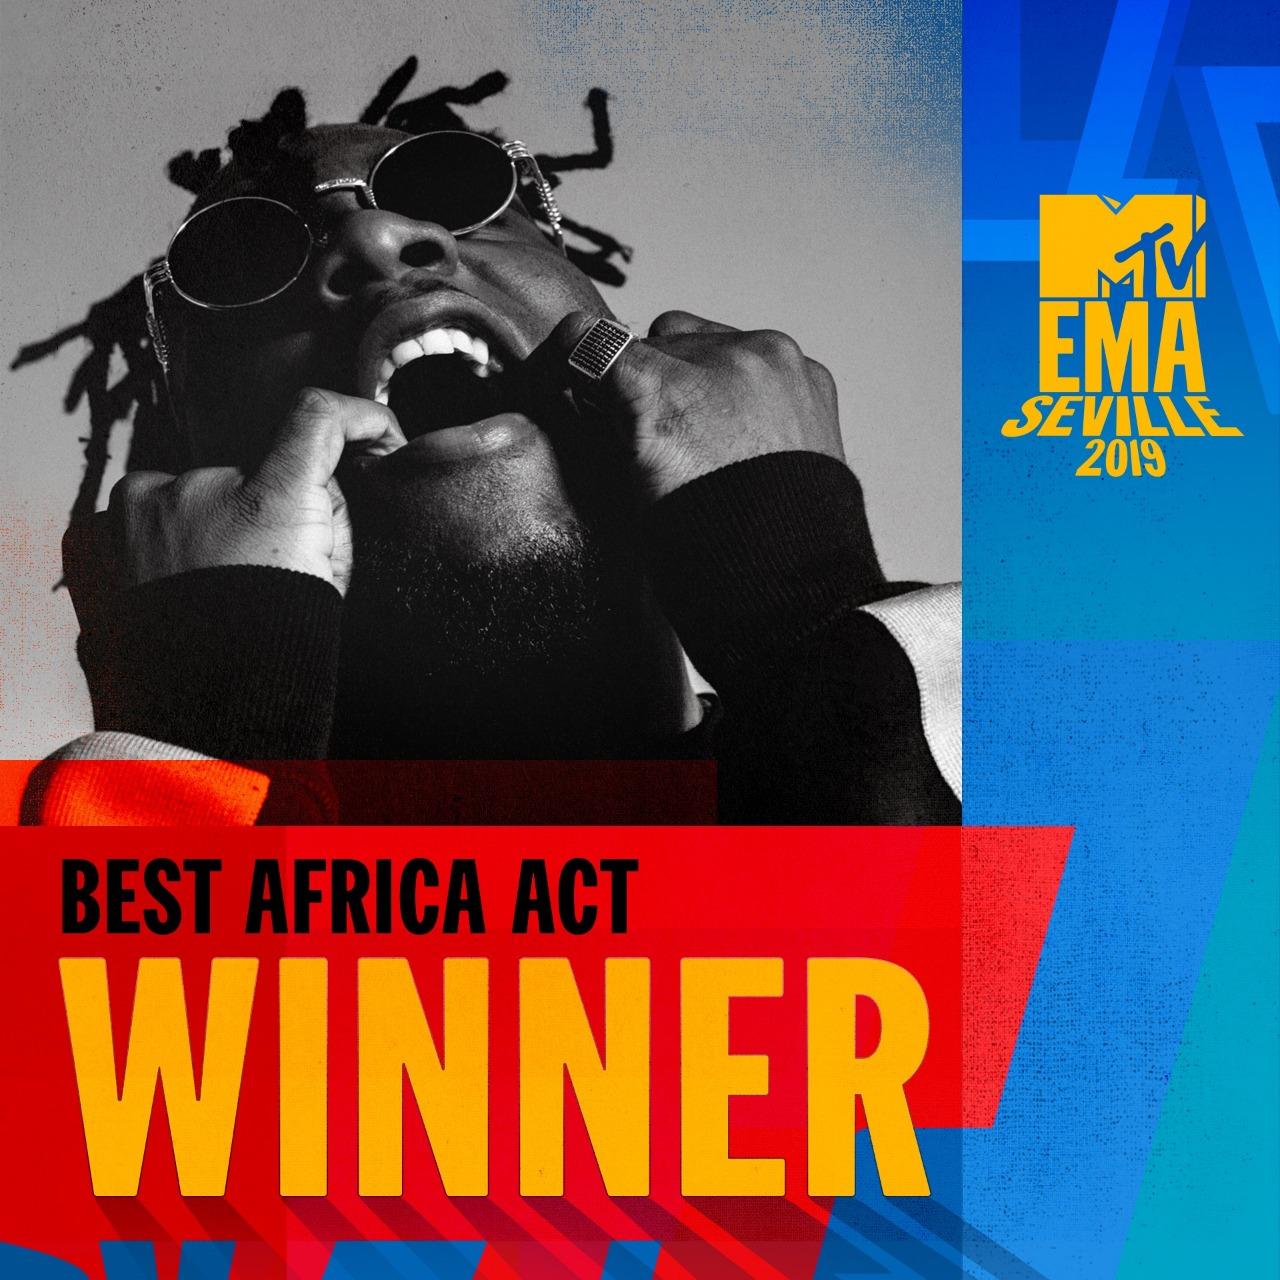 Burna Boy Wins 'Best Africa Act' Award at 2019 MTV EMA's